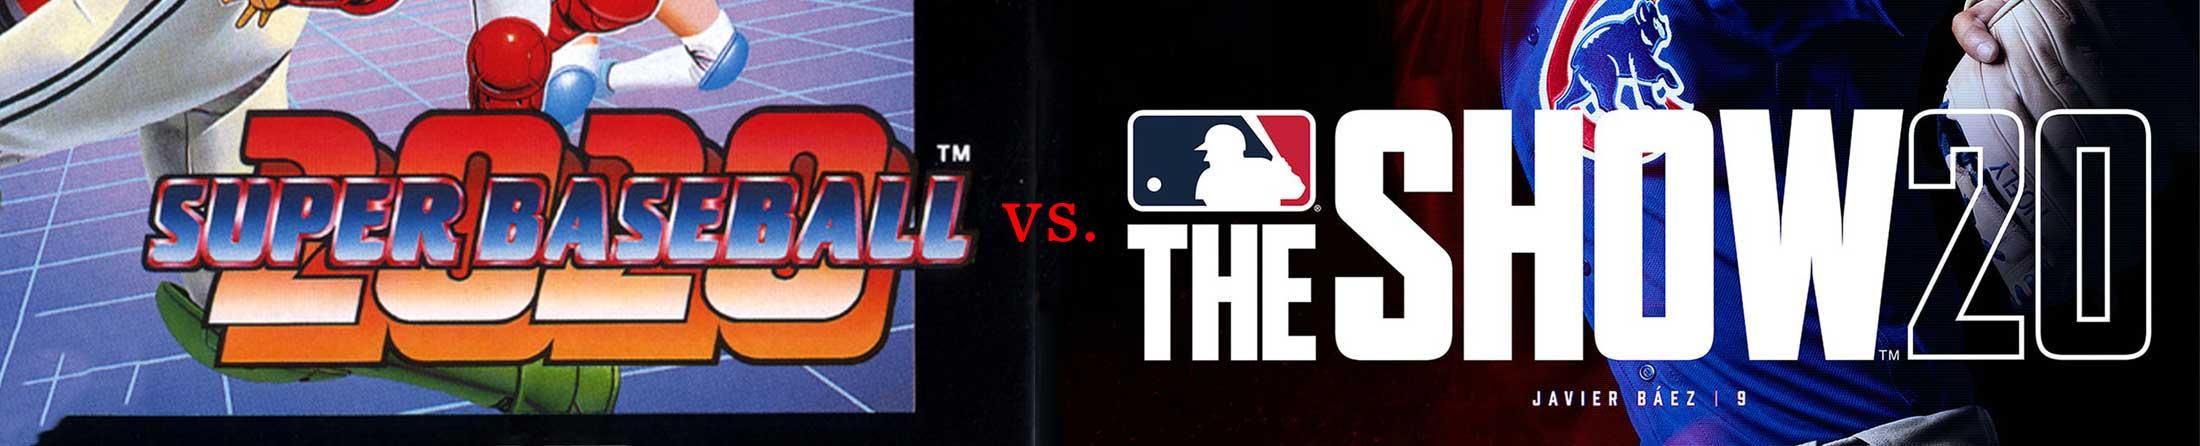 Super Baseball 2020 vs. MLB The Show '20 header